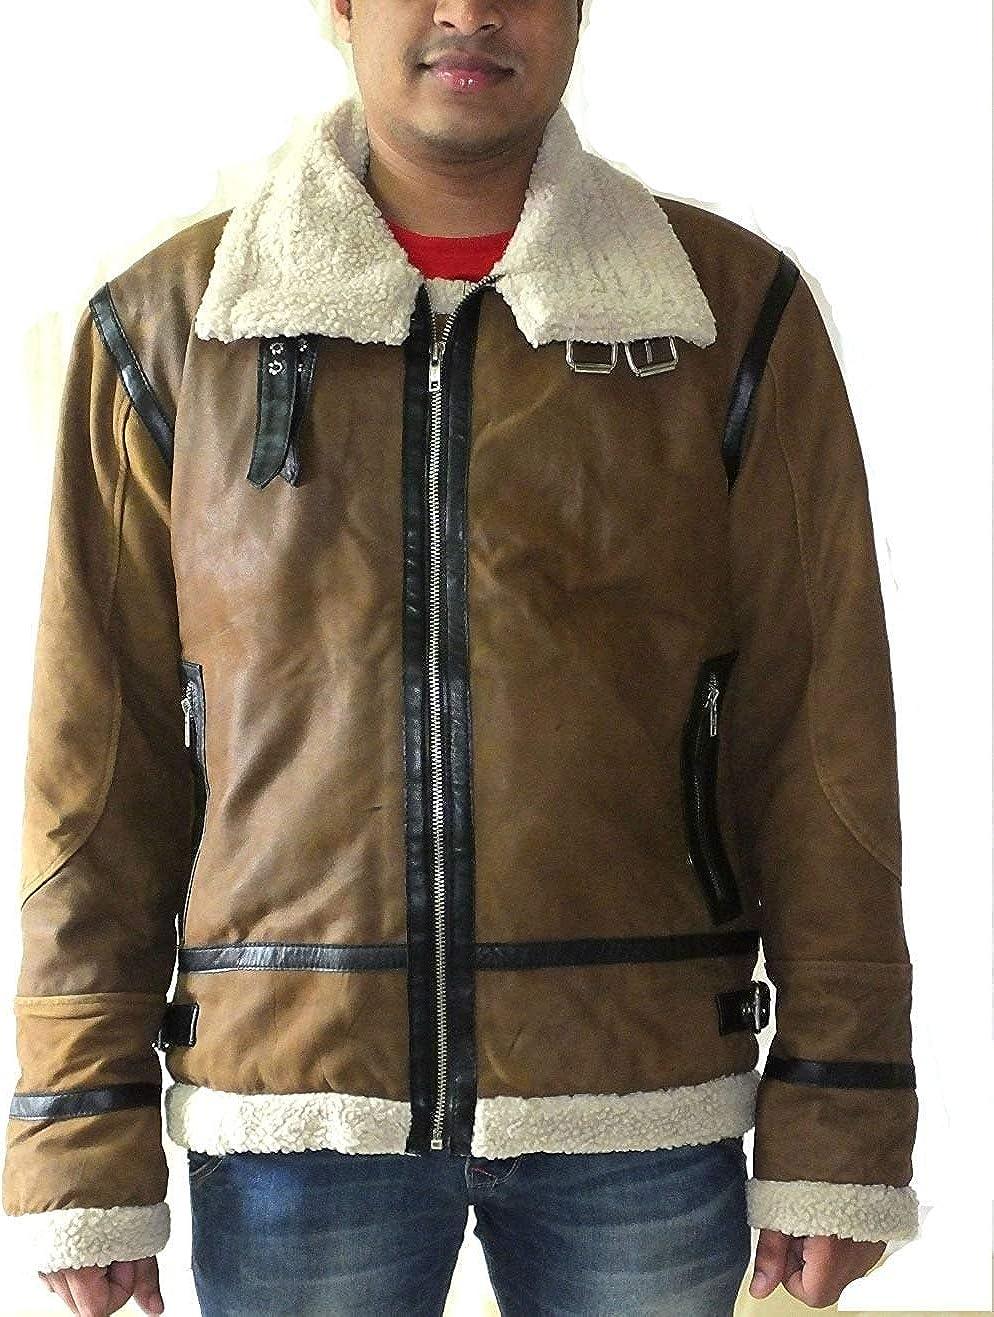 World of Leather Distressed Lambskin Leather Jacket Fur Biker Moto